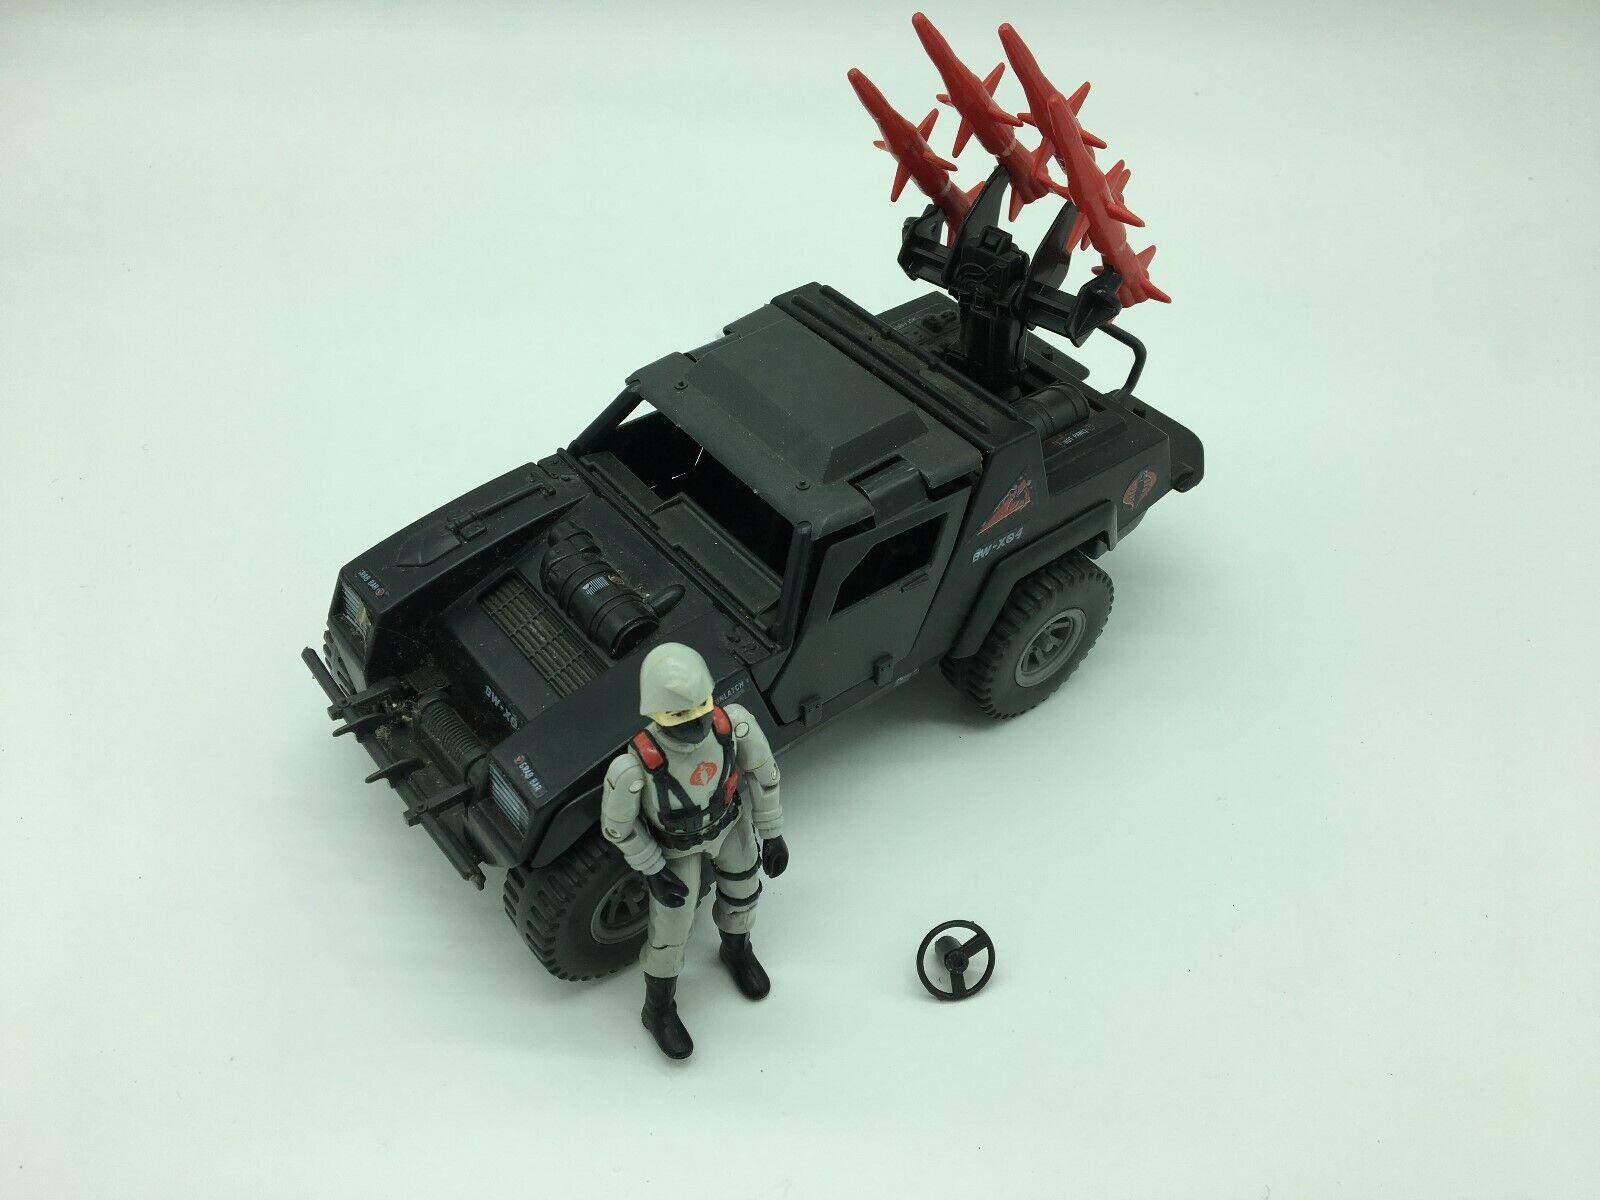 Fuerza De Acción Gi Joe Cobra noche vehículo de ataque, 1980S, Completa,